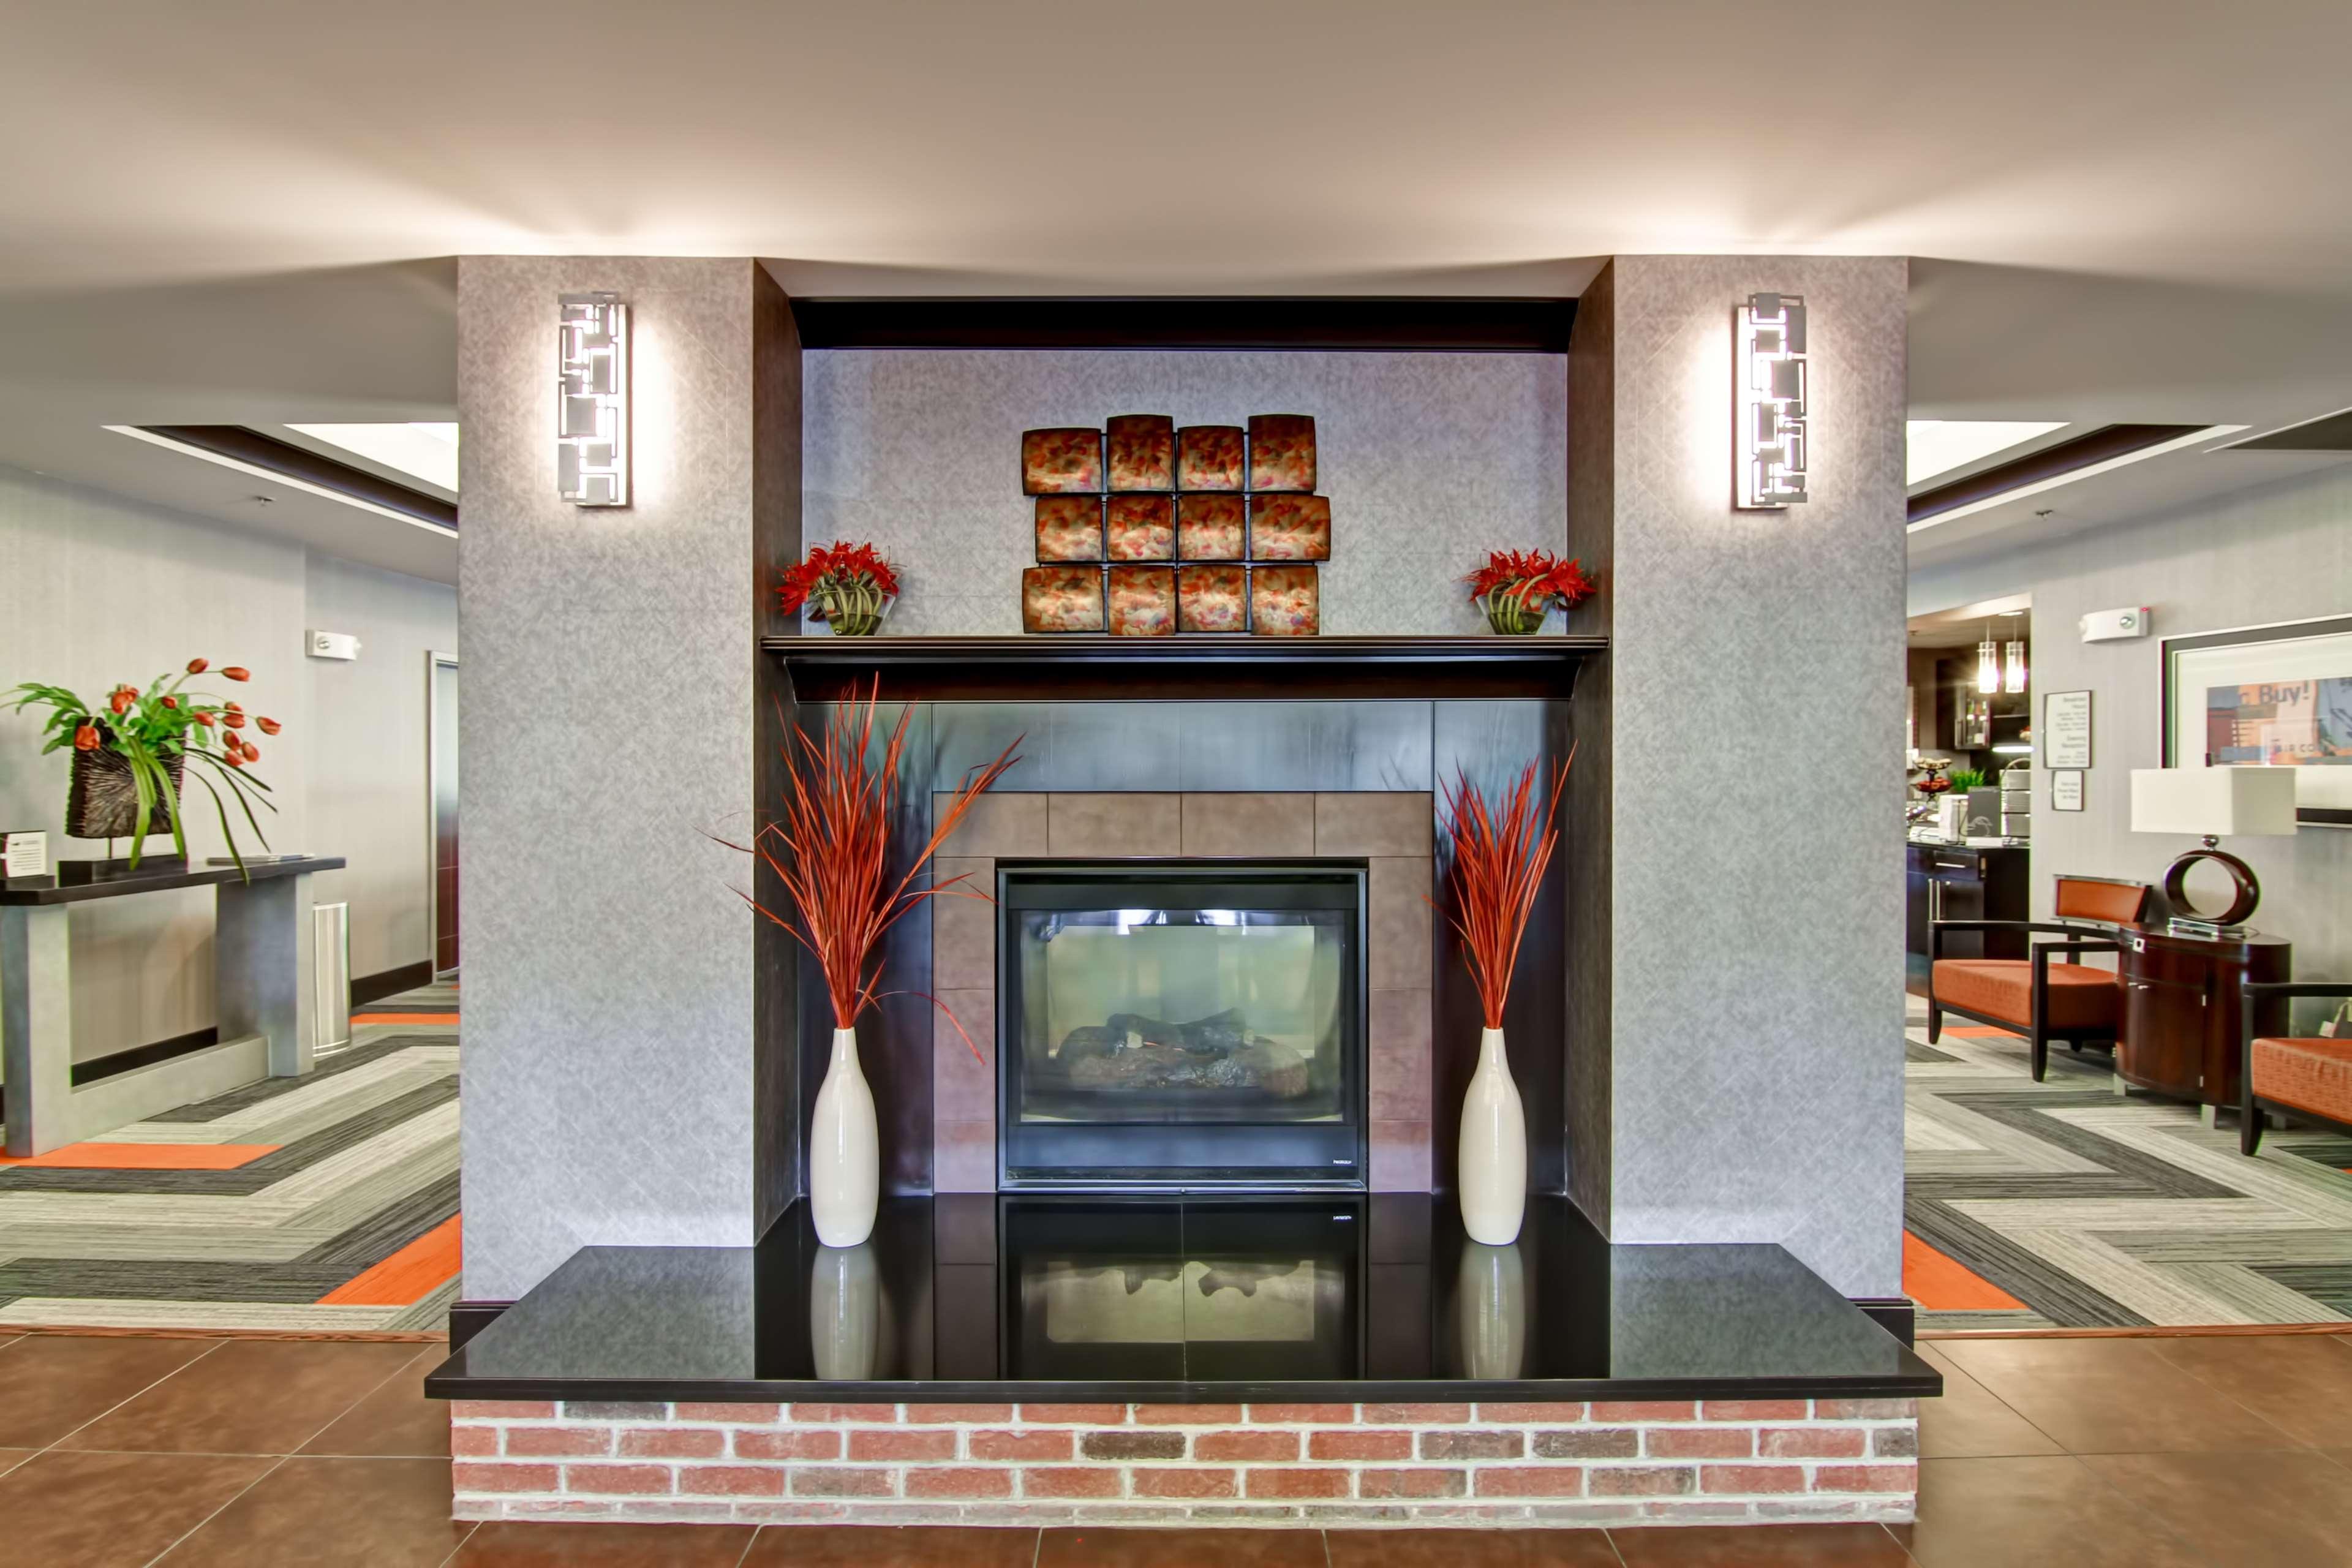 Homewood Suites by Hilton Cincinnati Airport South-Florence image 5